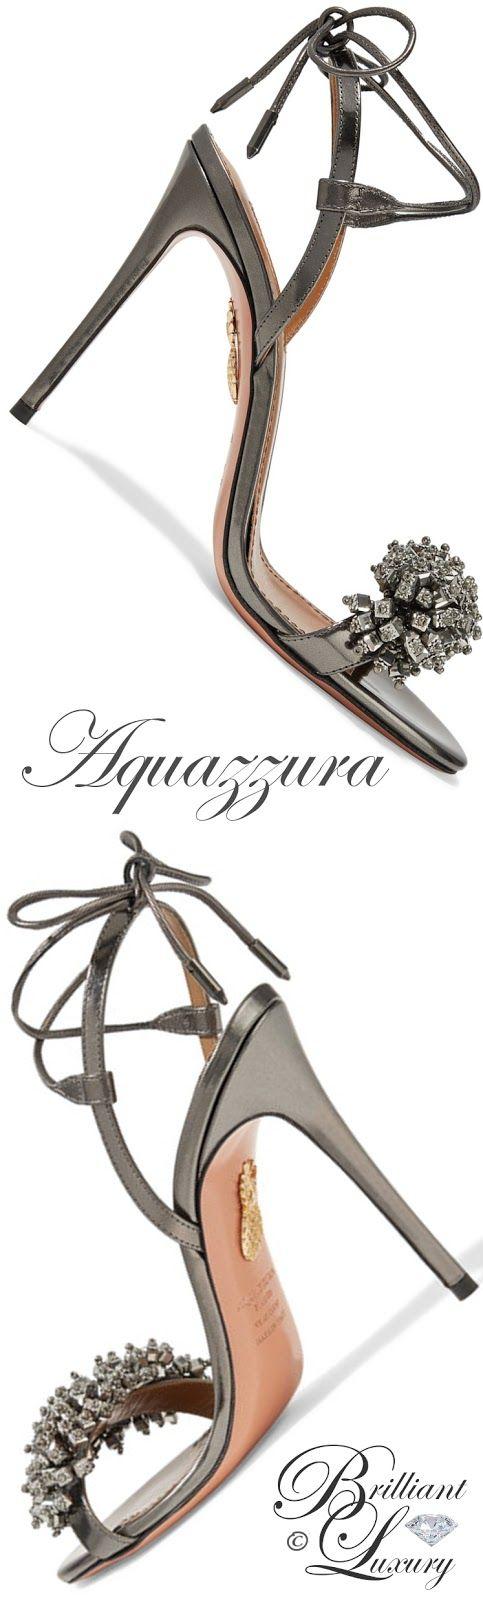 Brilliant Luxury by Emmy DE ♦Aquazzura Monaco crystal-embellished metallic leather sandals